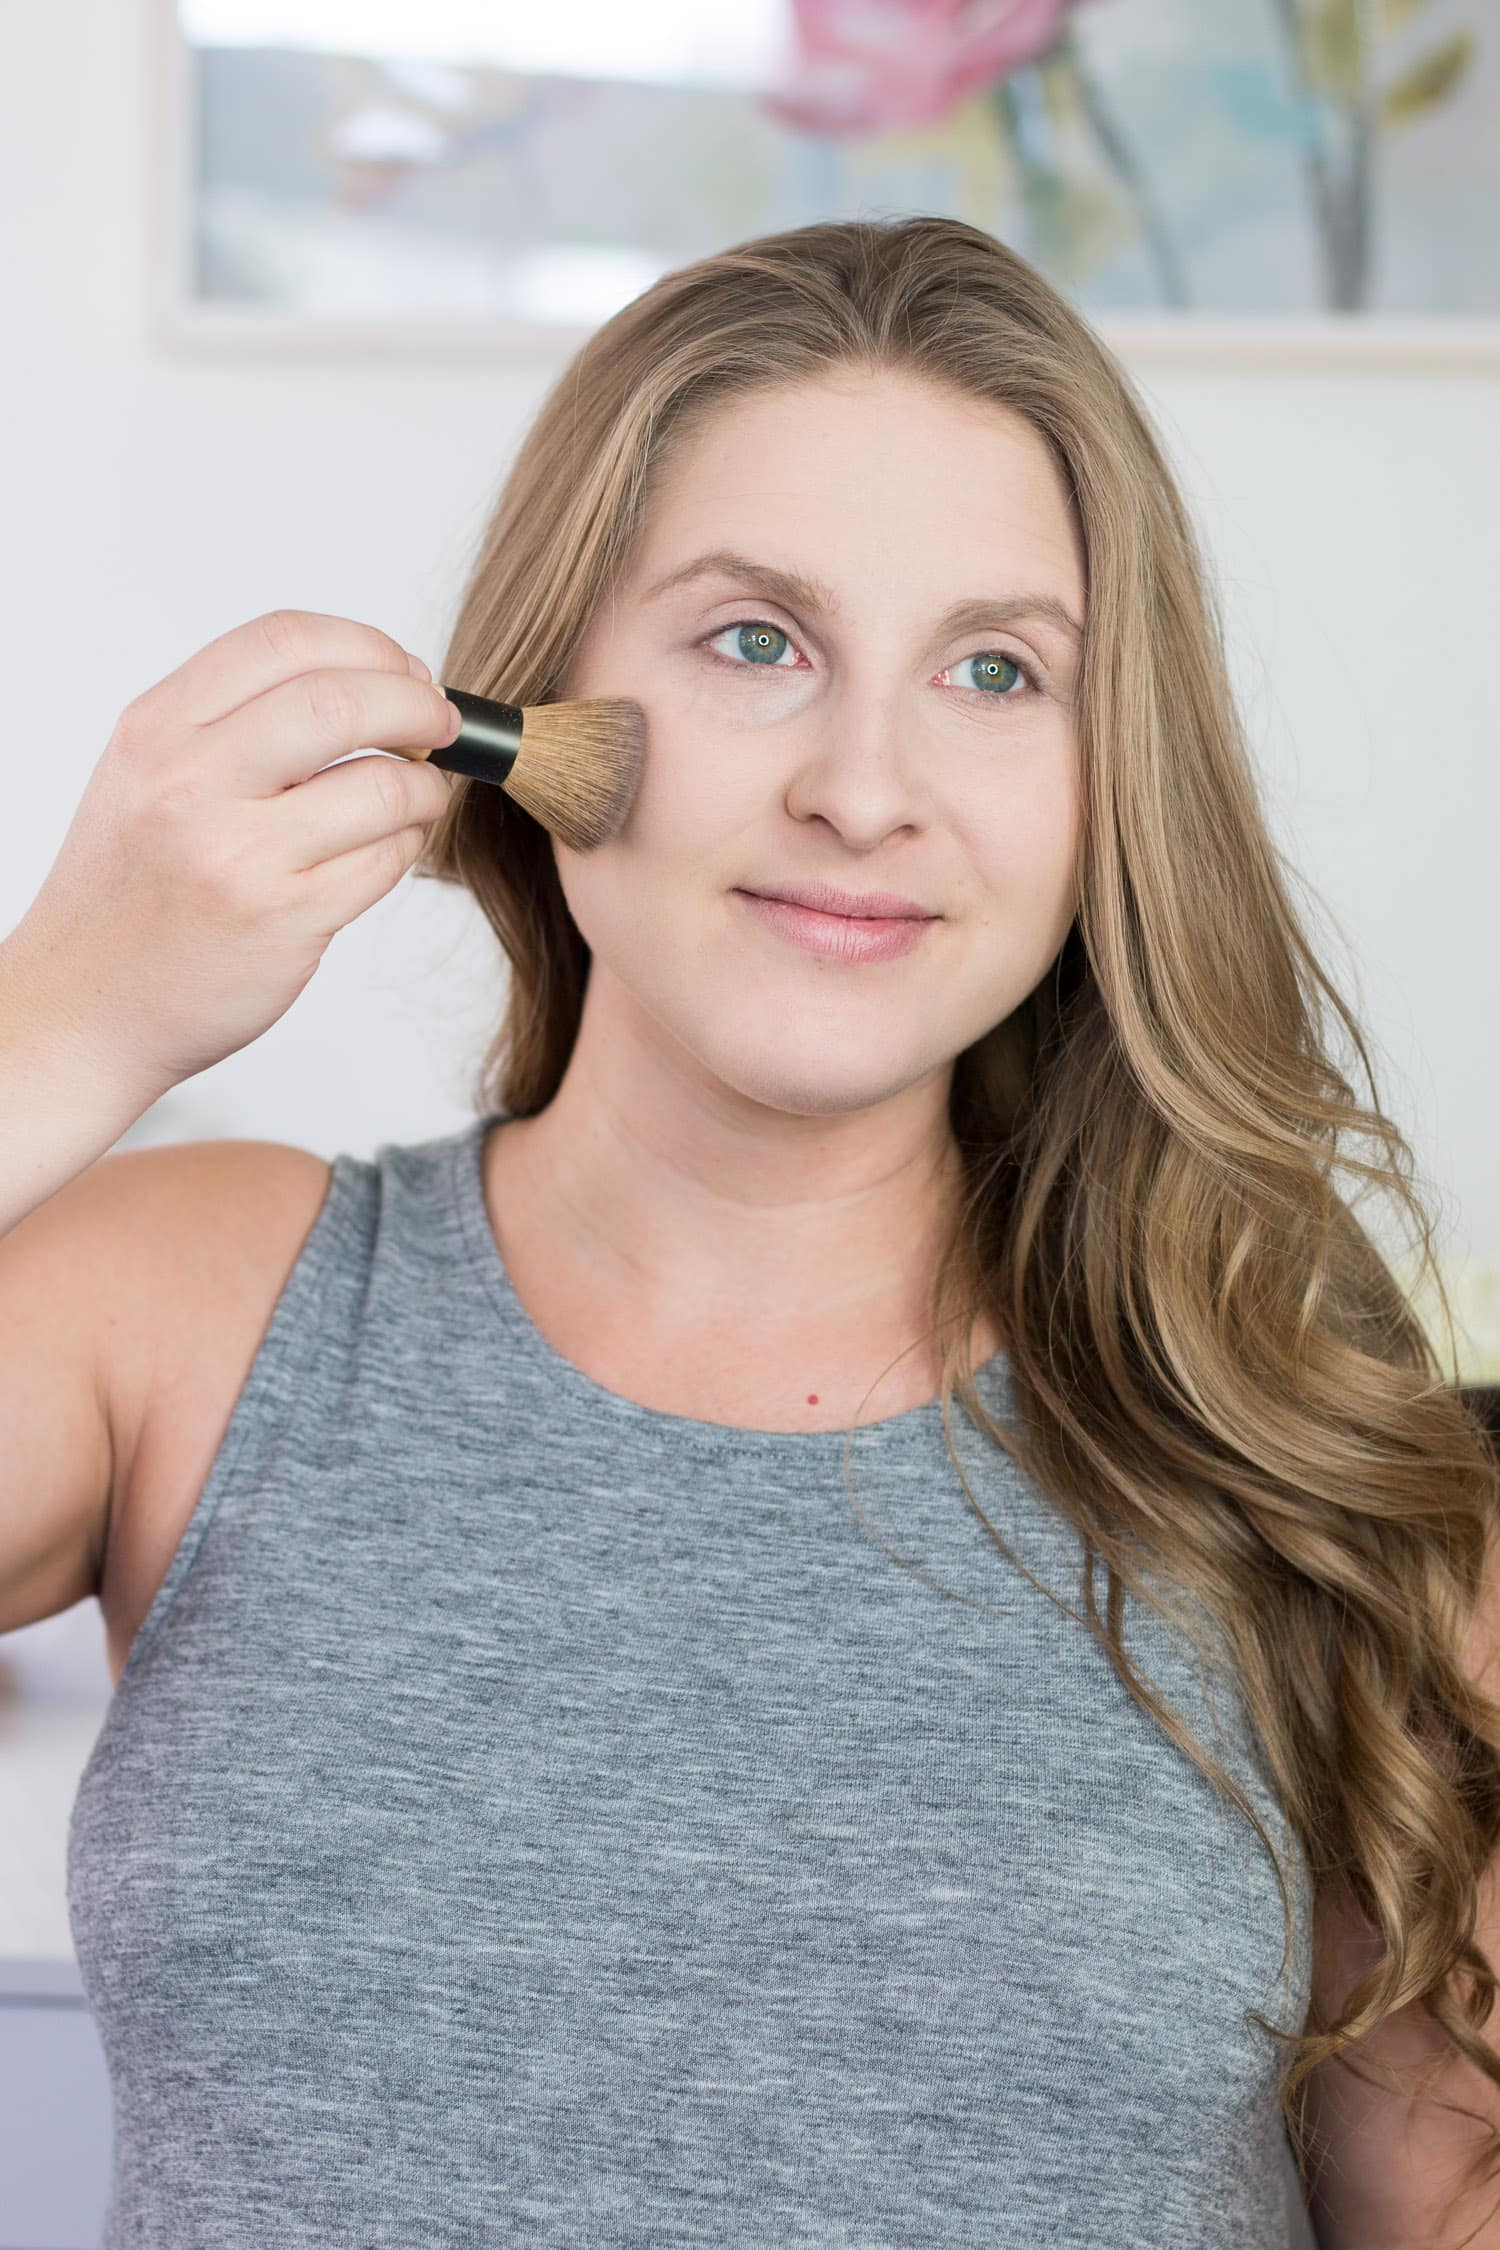 jane-iredale-makeup-tutorial-review-dirty blonde hair beautiful